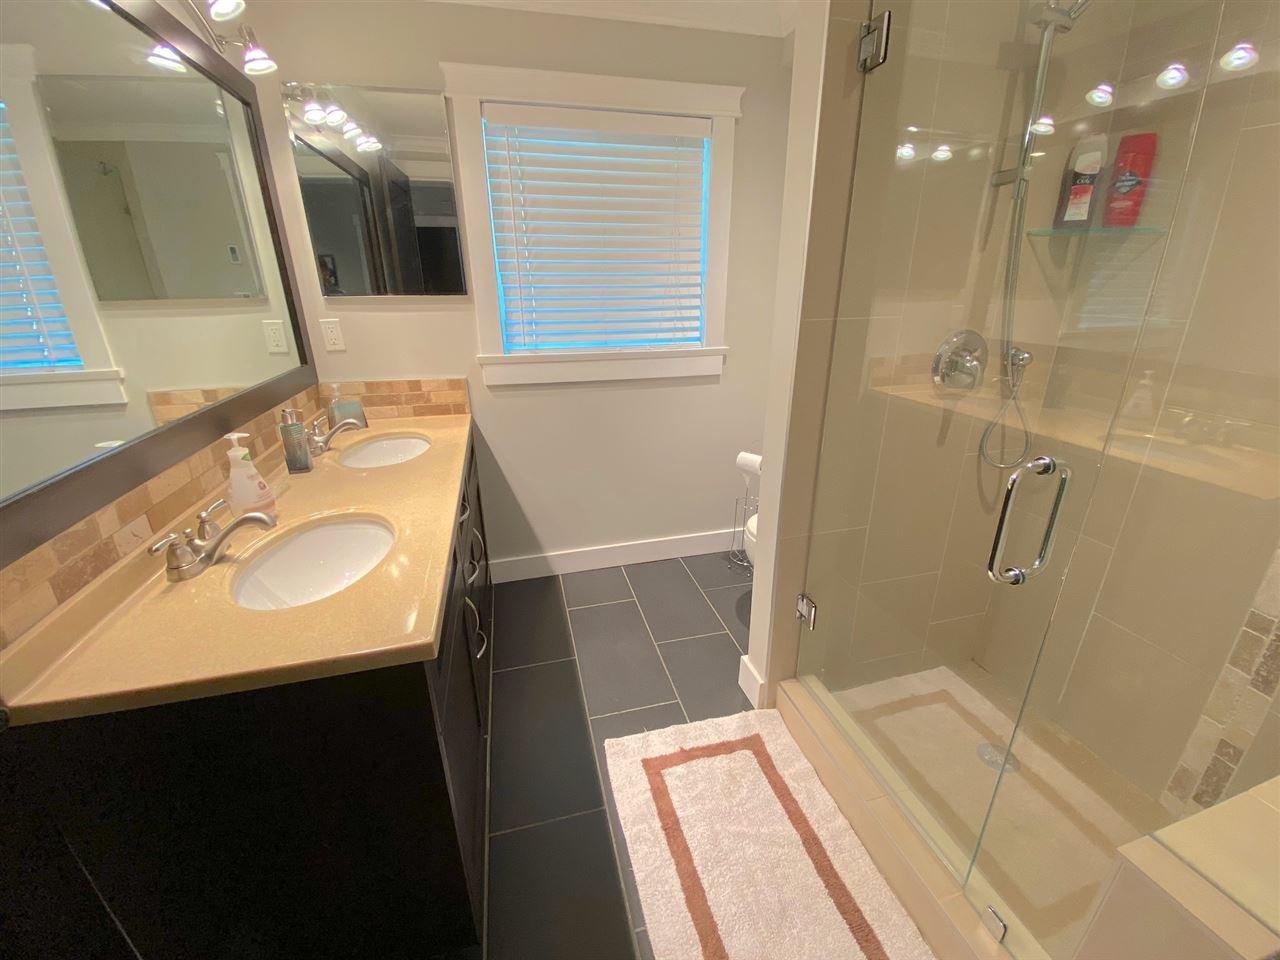 Photo 11: Photos: 555 55A STREET in Delta: Pebble Hill House for sale (Tsawwassen)  : MLS®# R2481635